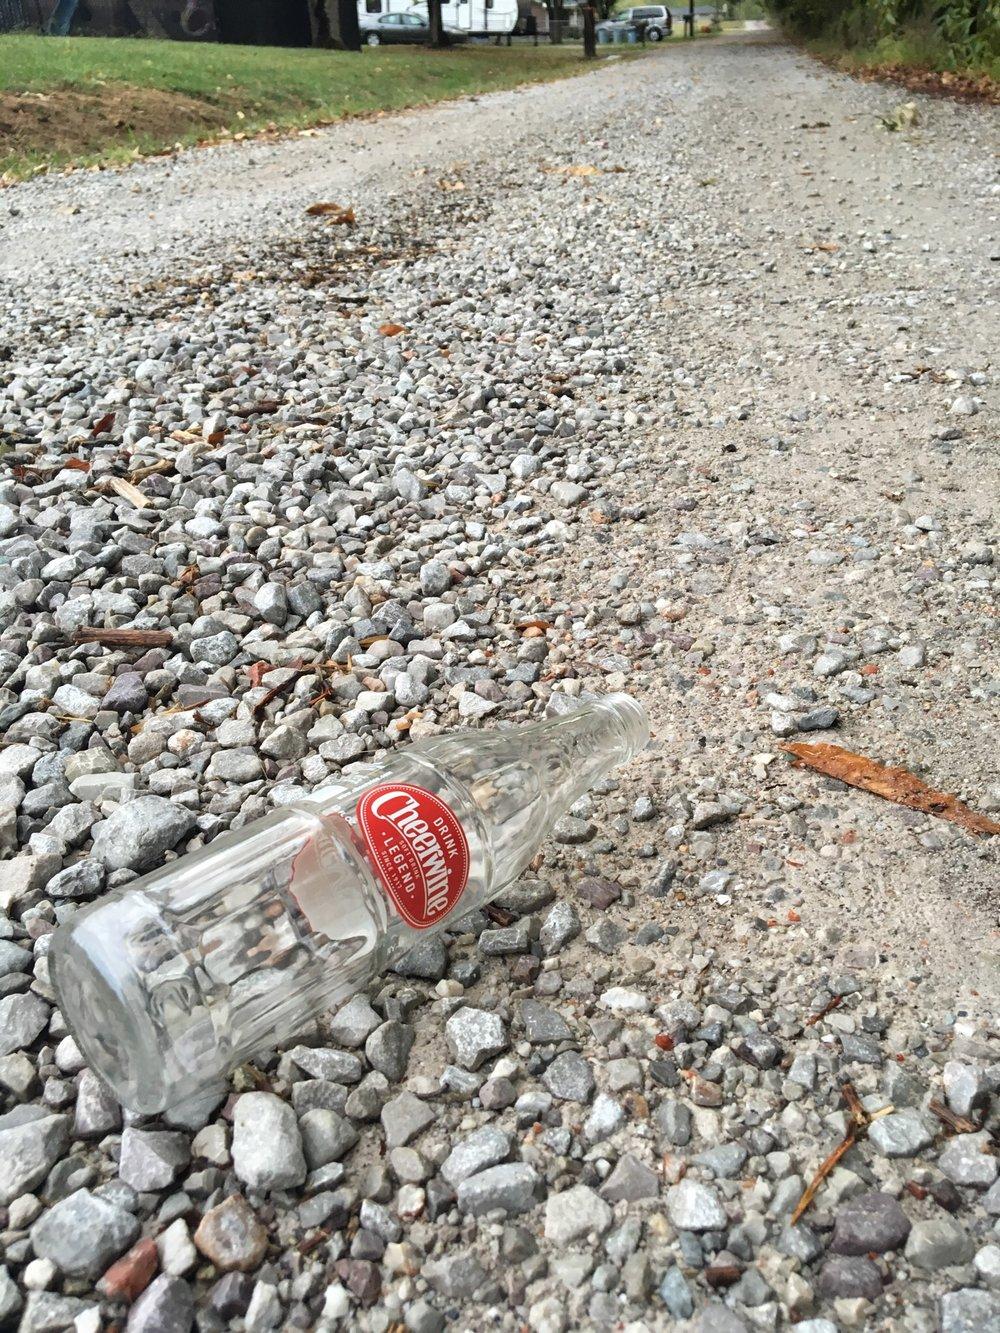 Glass Bottle on a Gravel Road - Original Frantic Finch